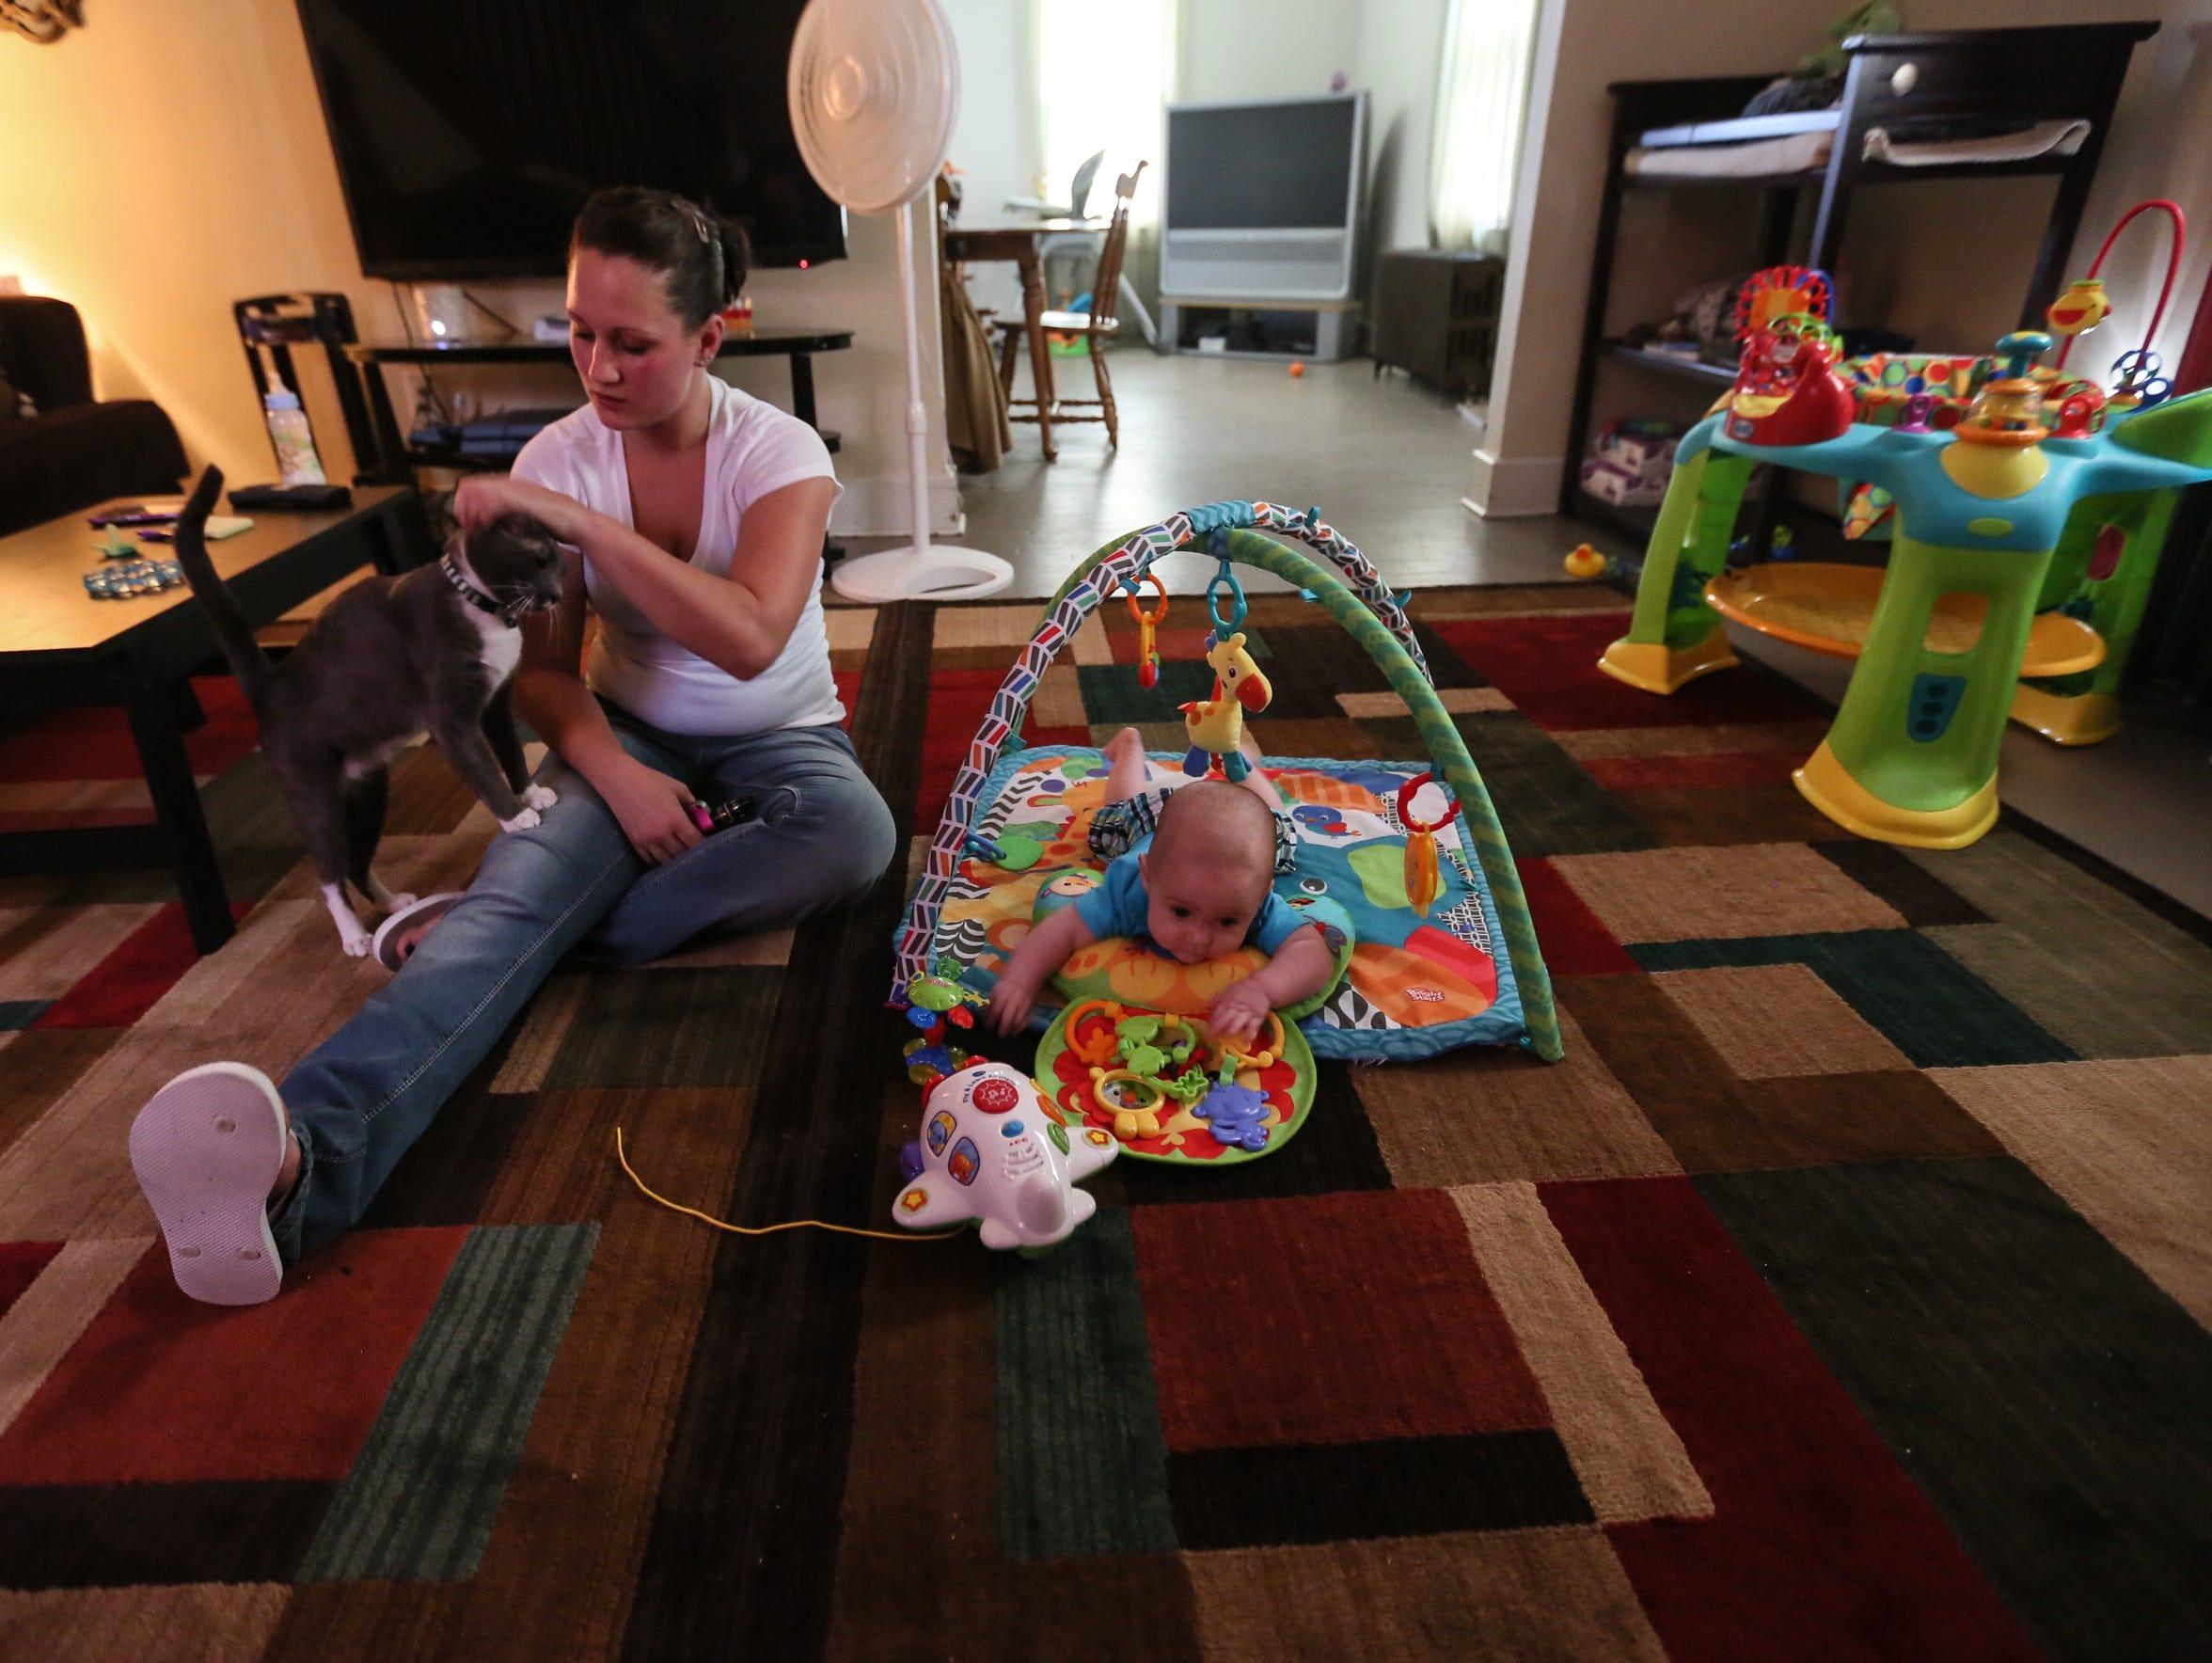 Amanda Lofland, 27, pets the family cat Harley while